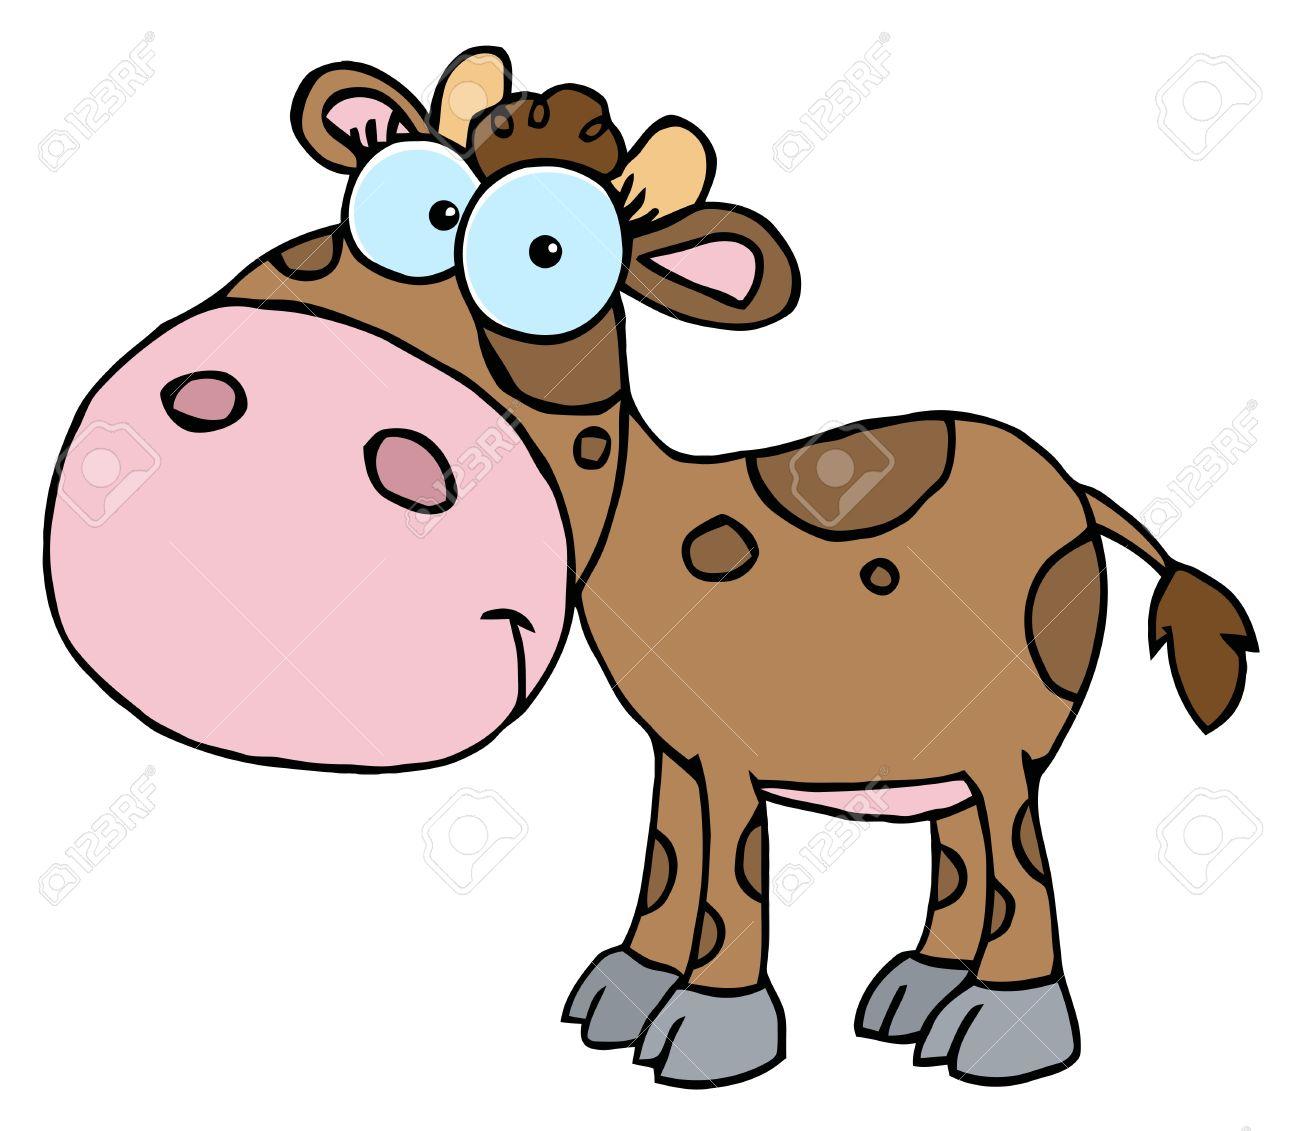 Mascot Cartoon Character Cute Little Cow Stock Vector - 6905243